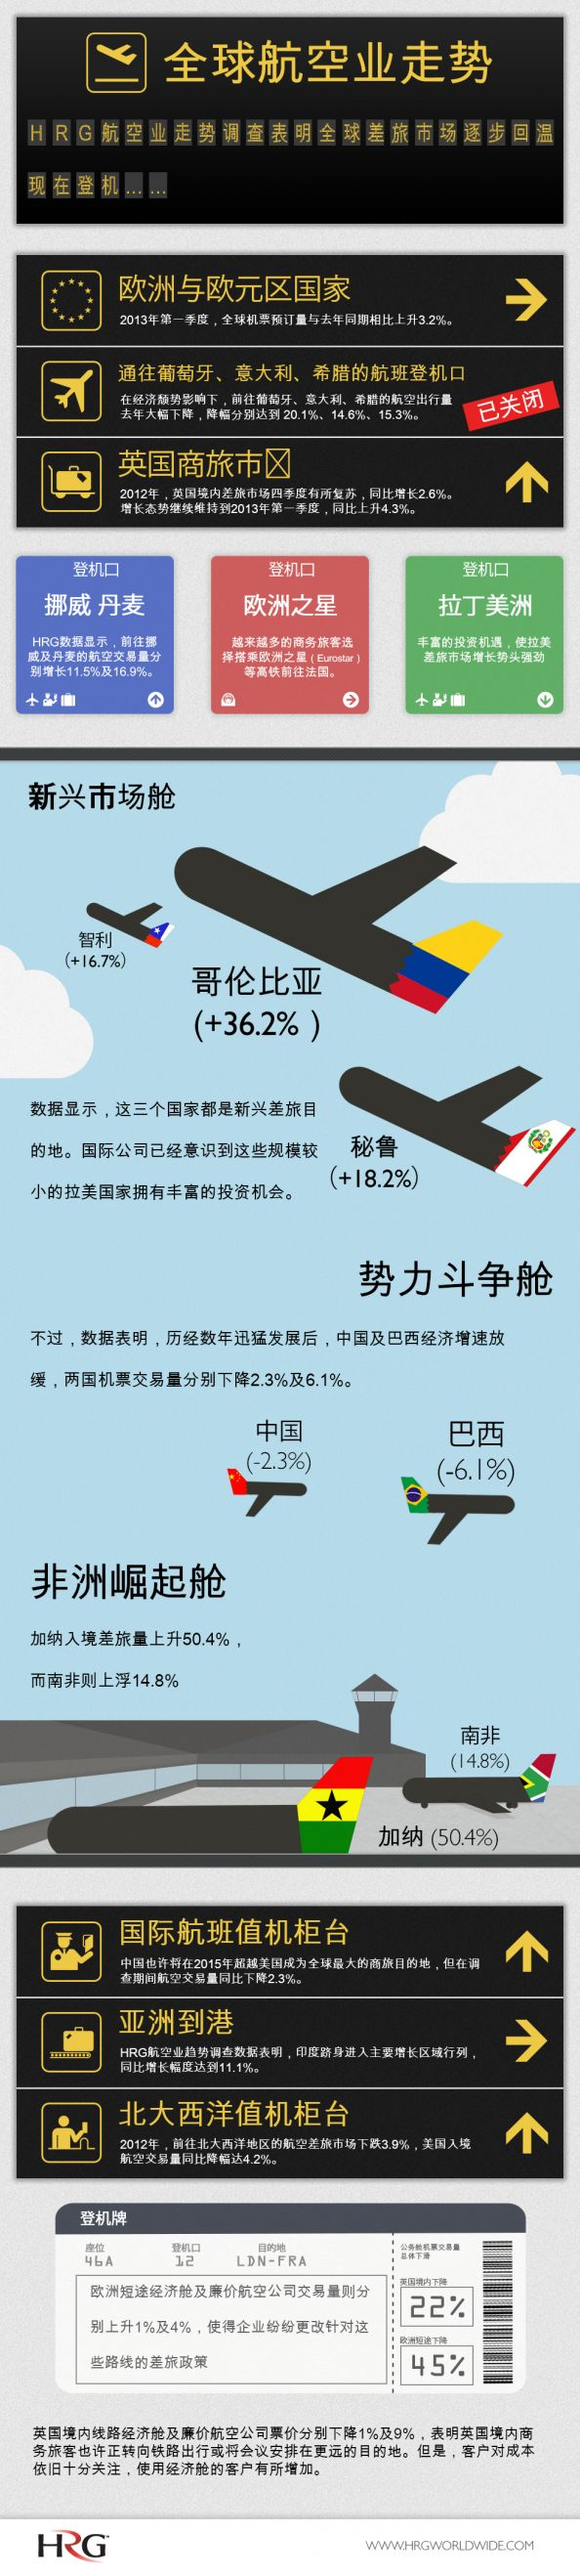 HRG - Air Trends (Mandarin Version) Infographic